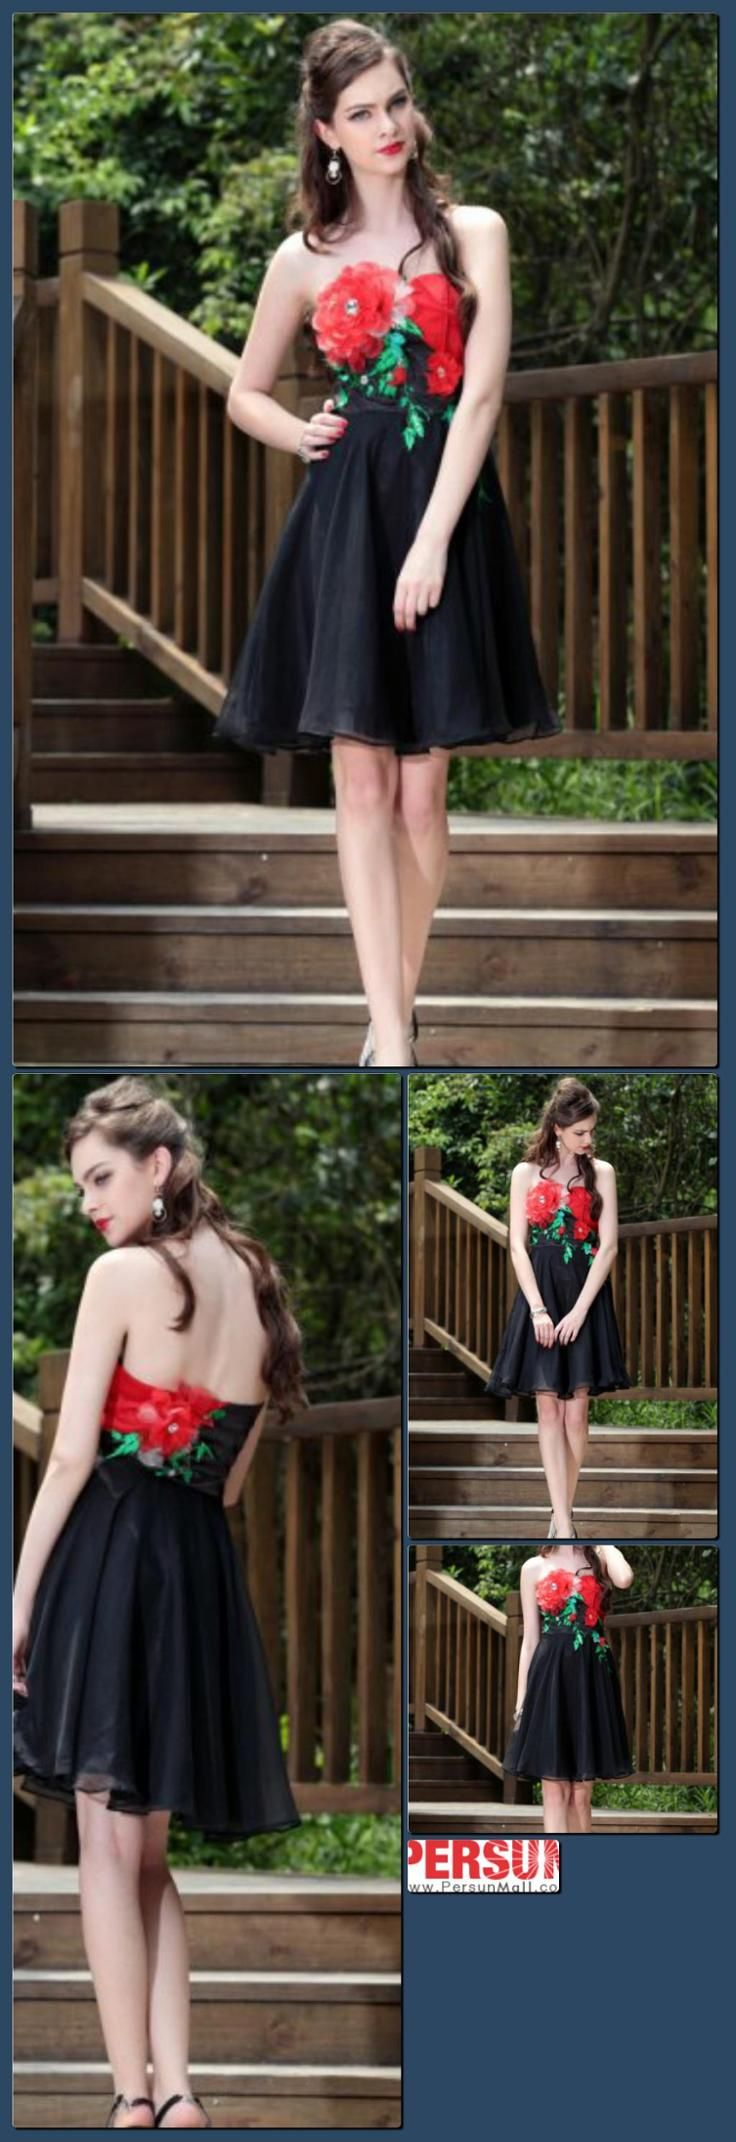 Cute A-line Strapless Sleeveless Chiffon&Satin Knee-length Cocktail Dress [PCBE0779]- US$138.44 - PersunMall.com   http://hoog.li/g?g=http%3A%2F%2Fwww.persunmall.com%2Fp%2Fcute-aline-strapless-sleeveless-chiffonsatin-kneelength-cocktail-dress-p-2849.html